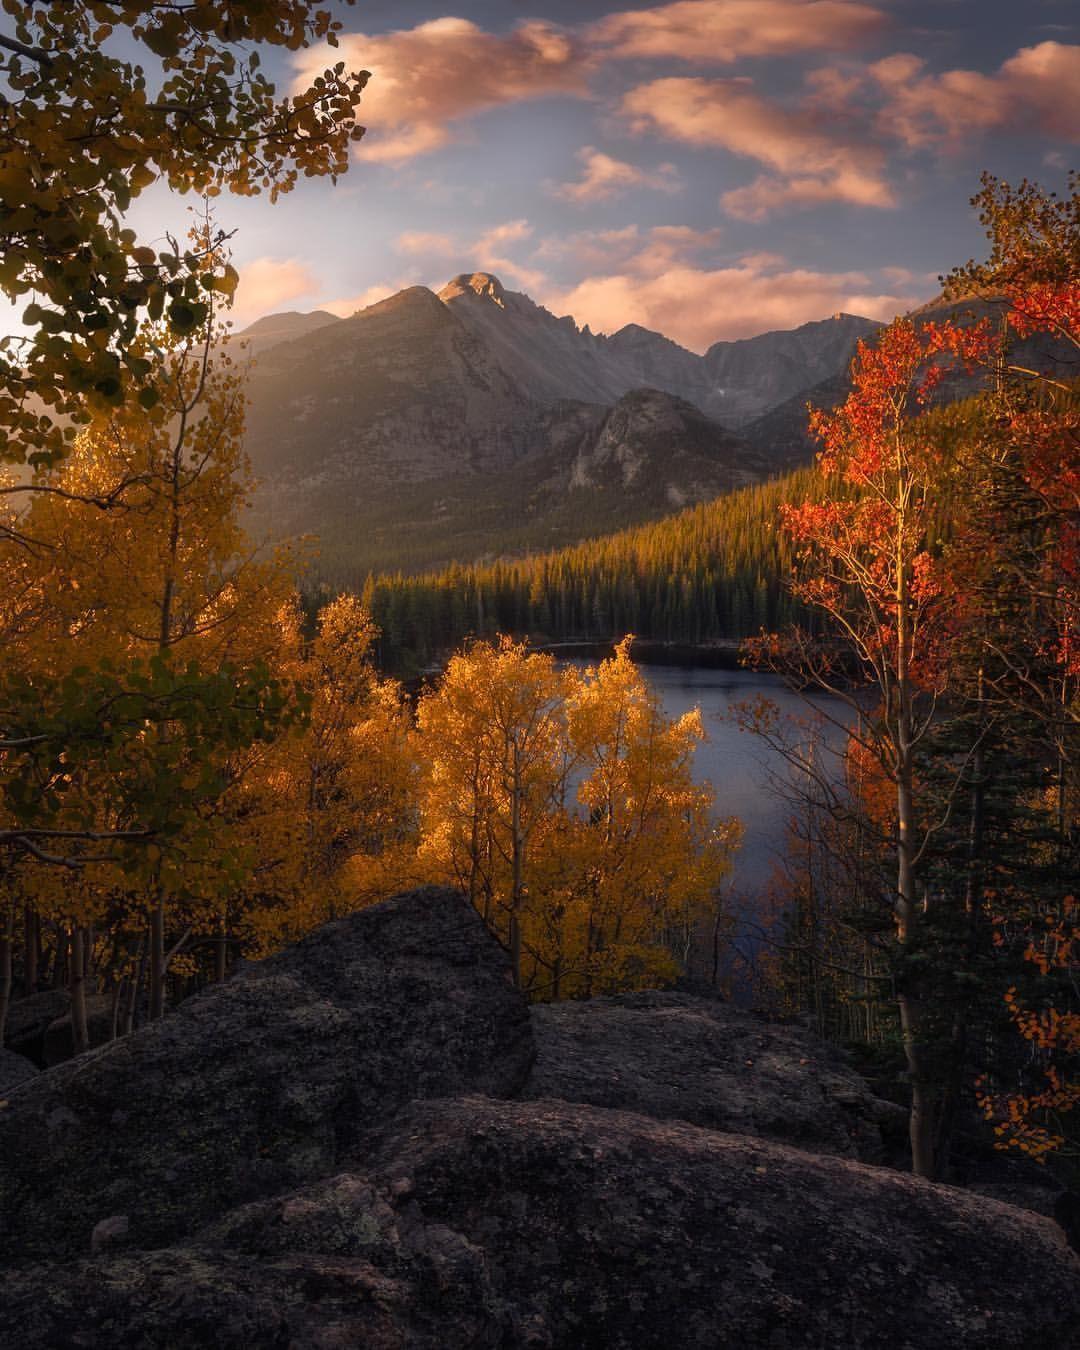 landscapes of colorado mountains